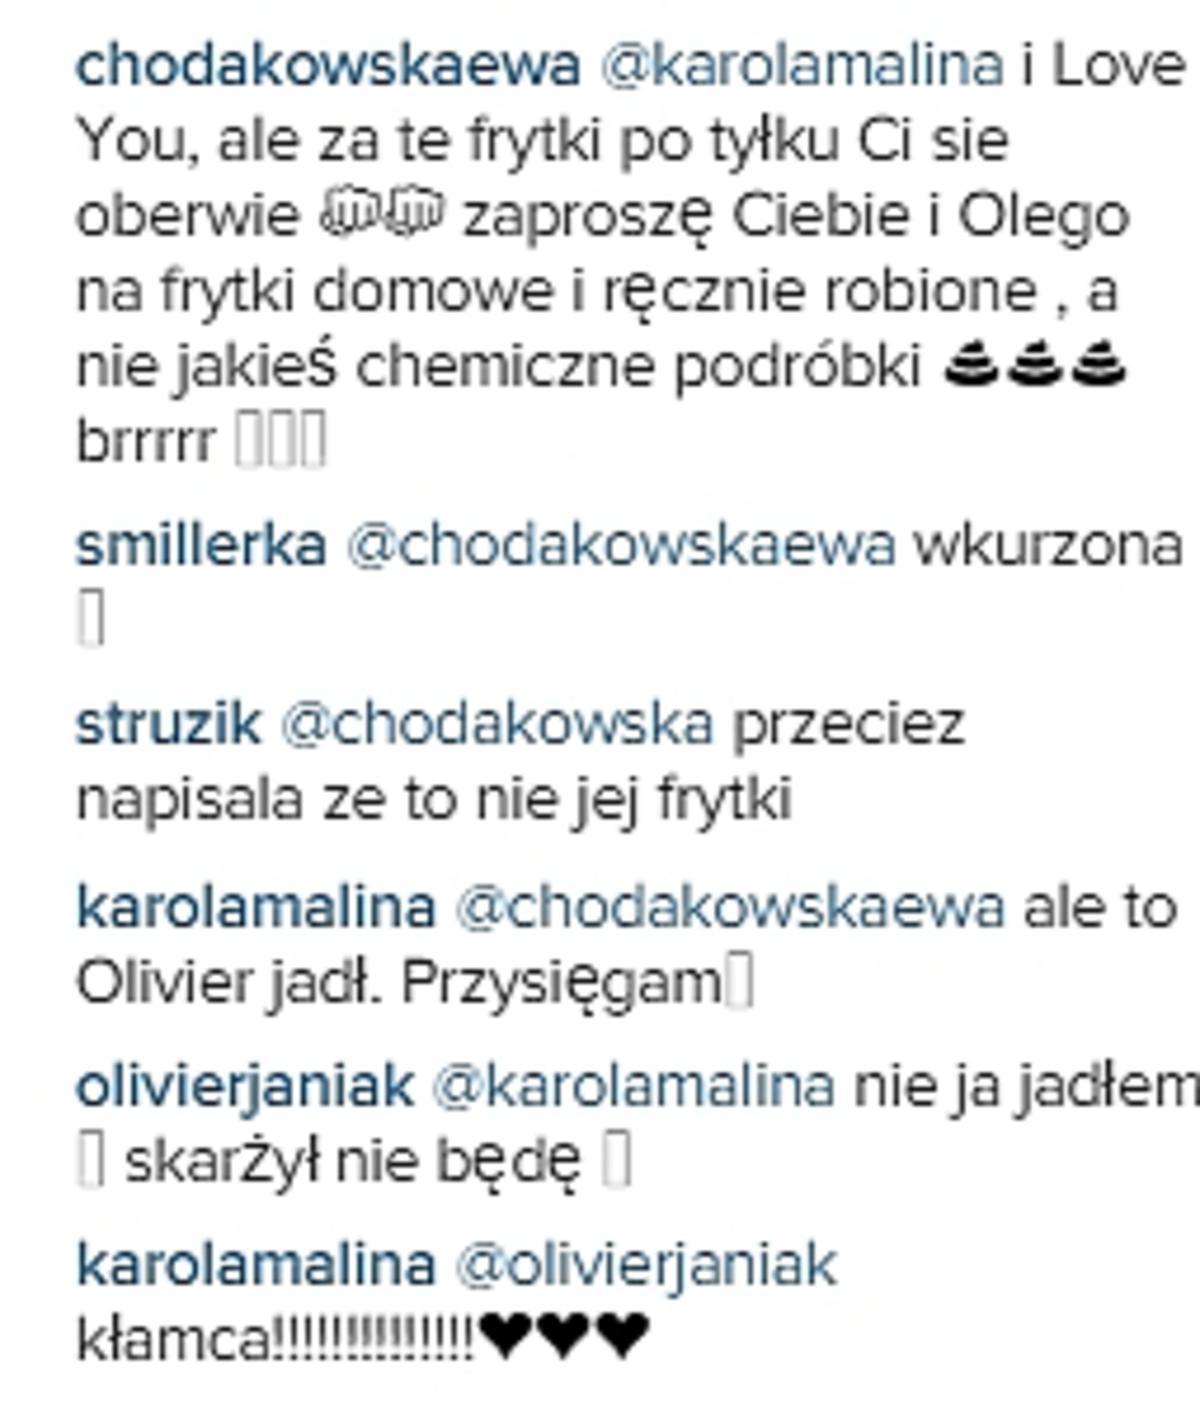 Chodakowska